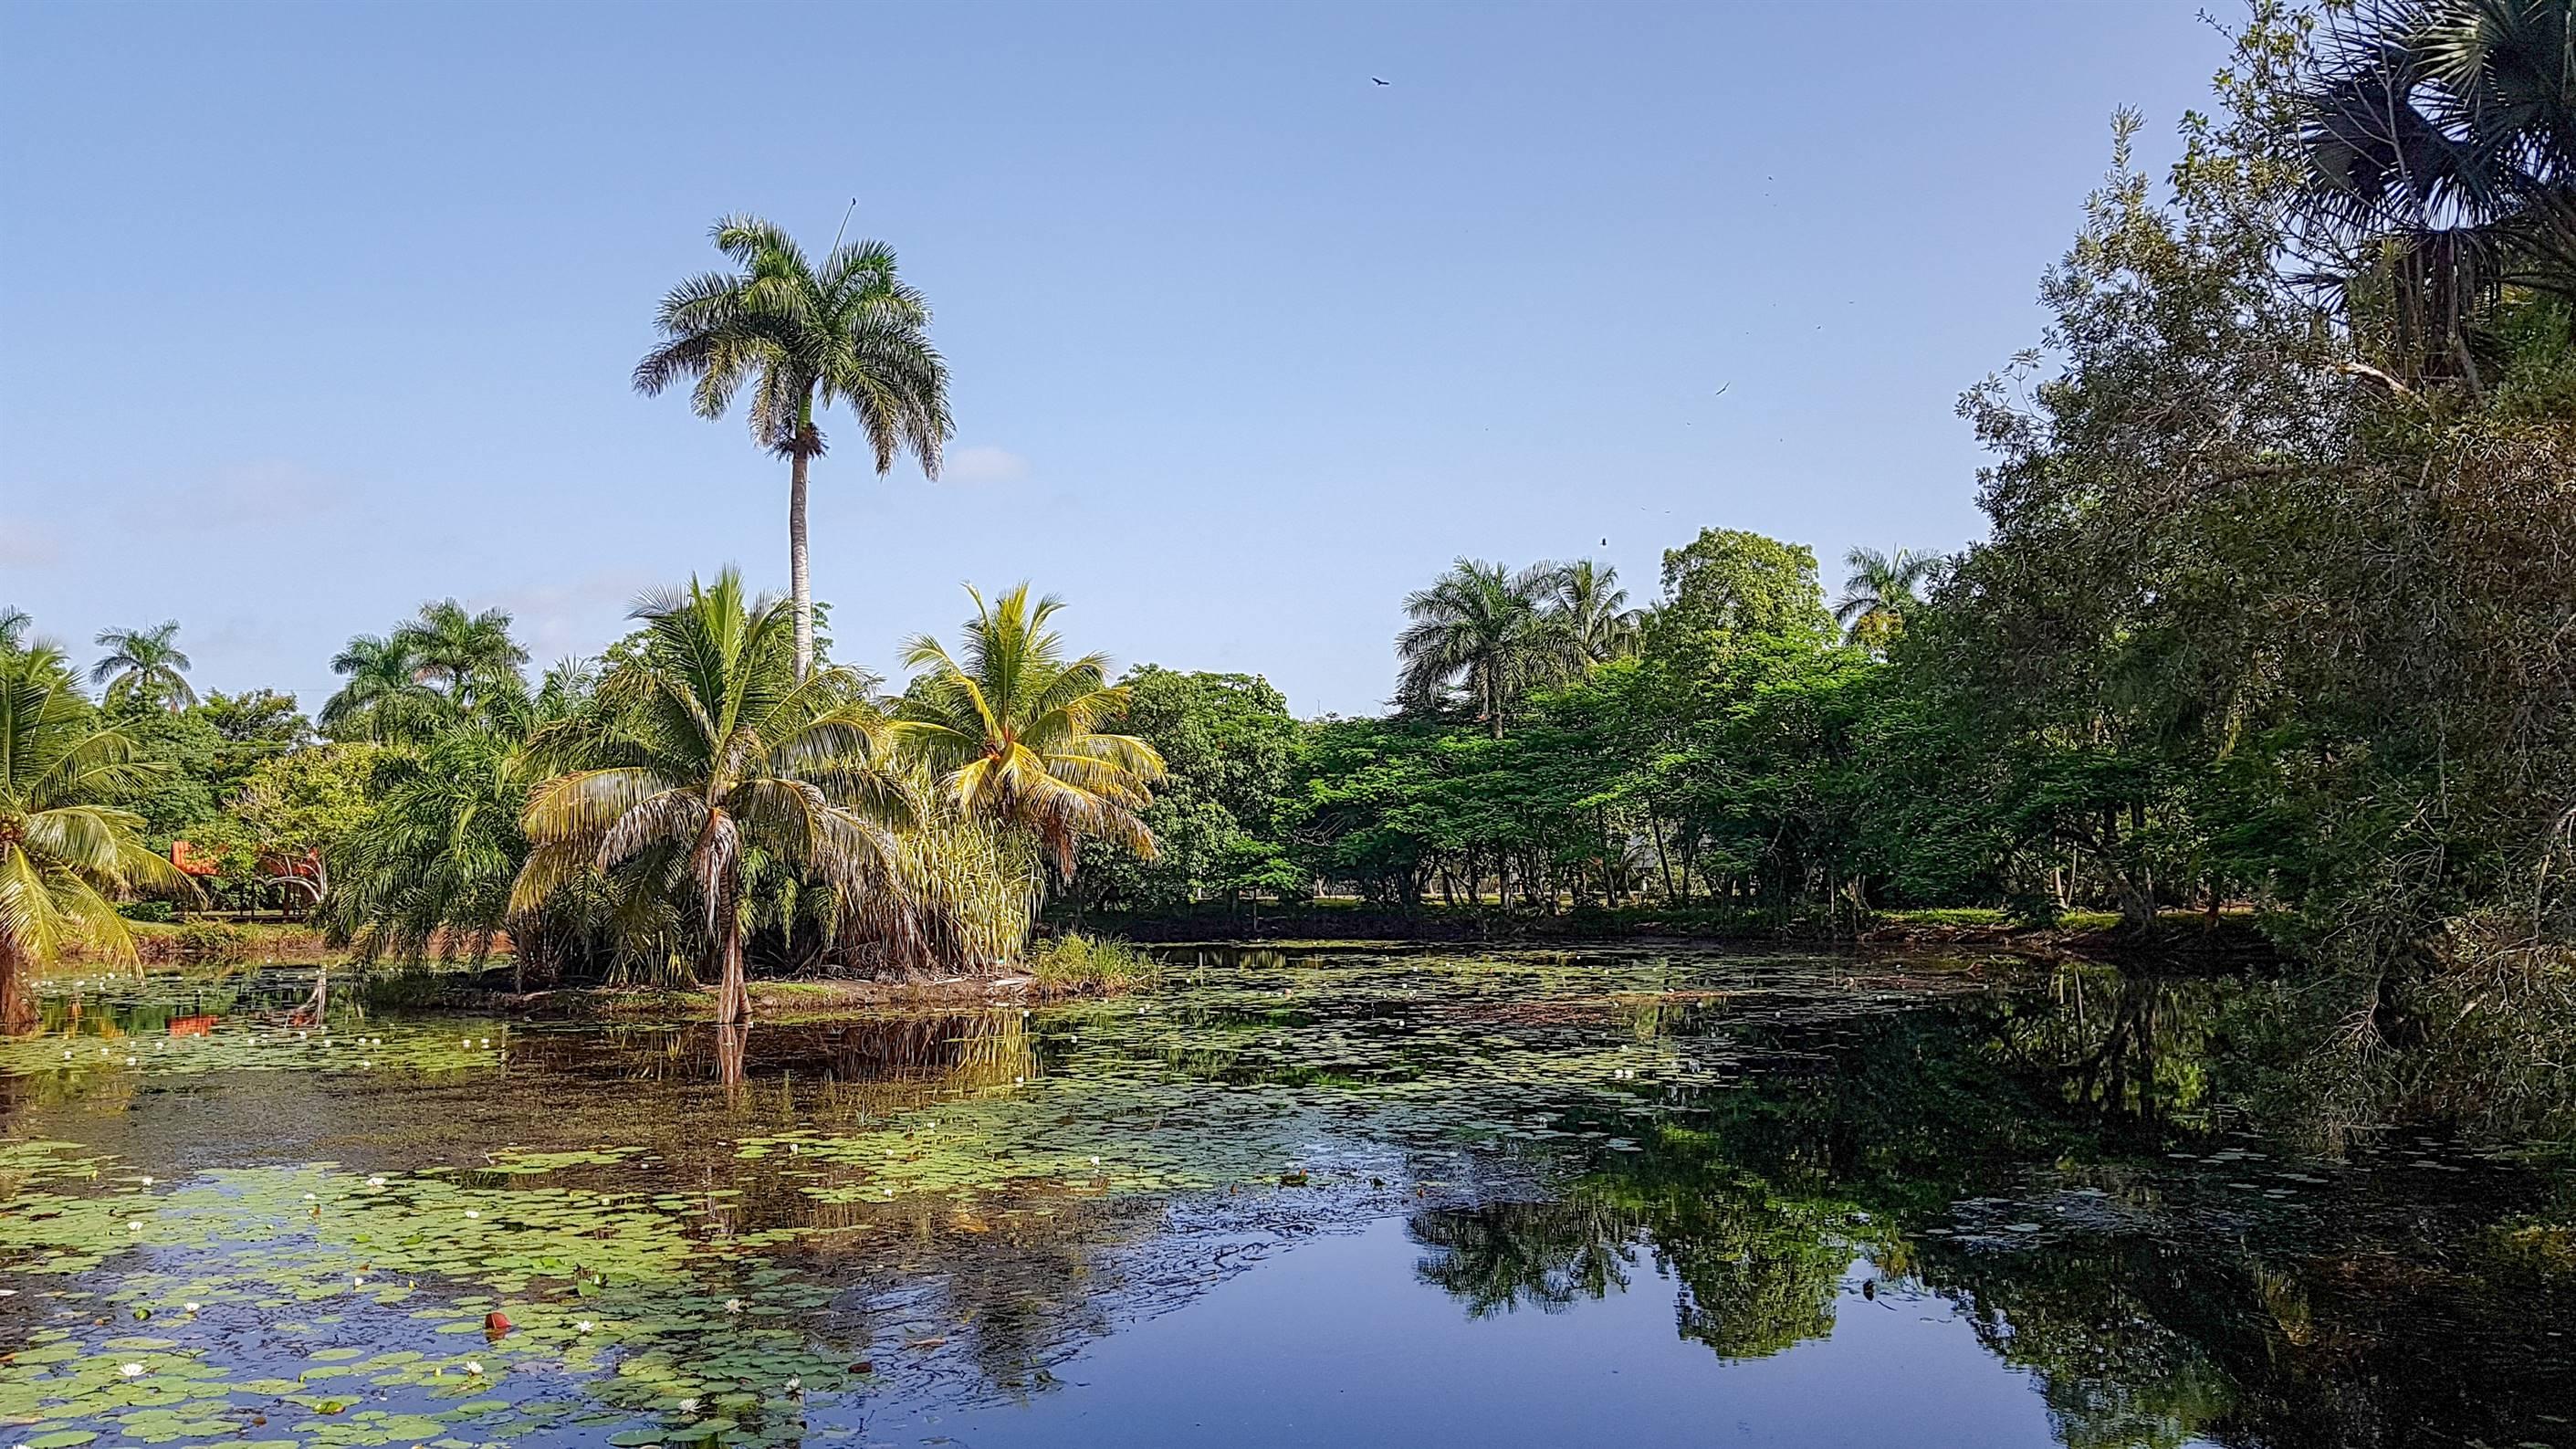 Ferme aux Crocodiles - Playa Larga - CUBA